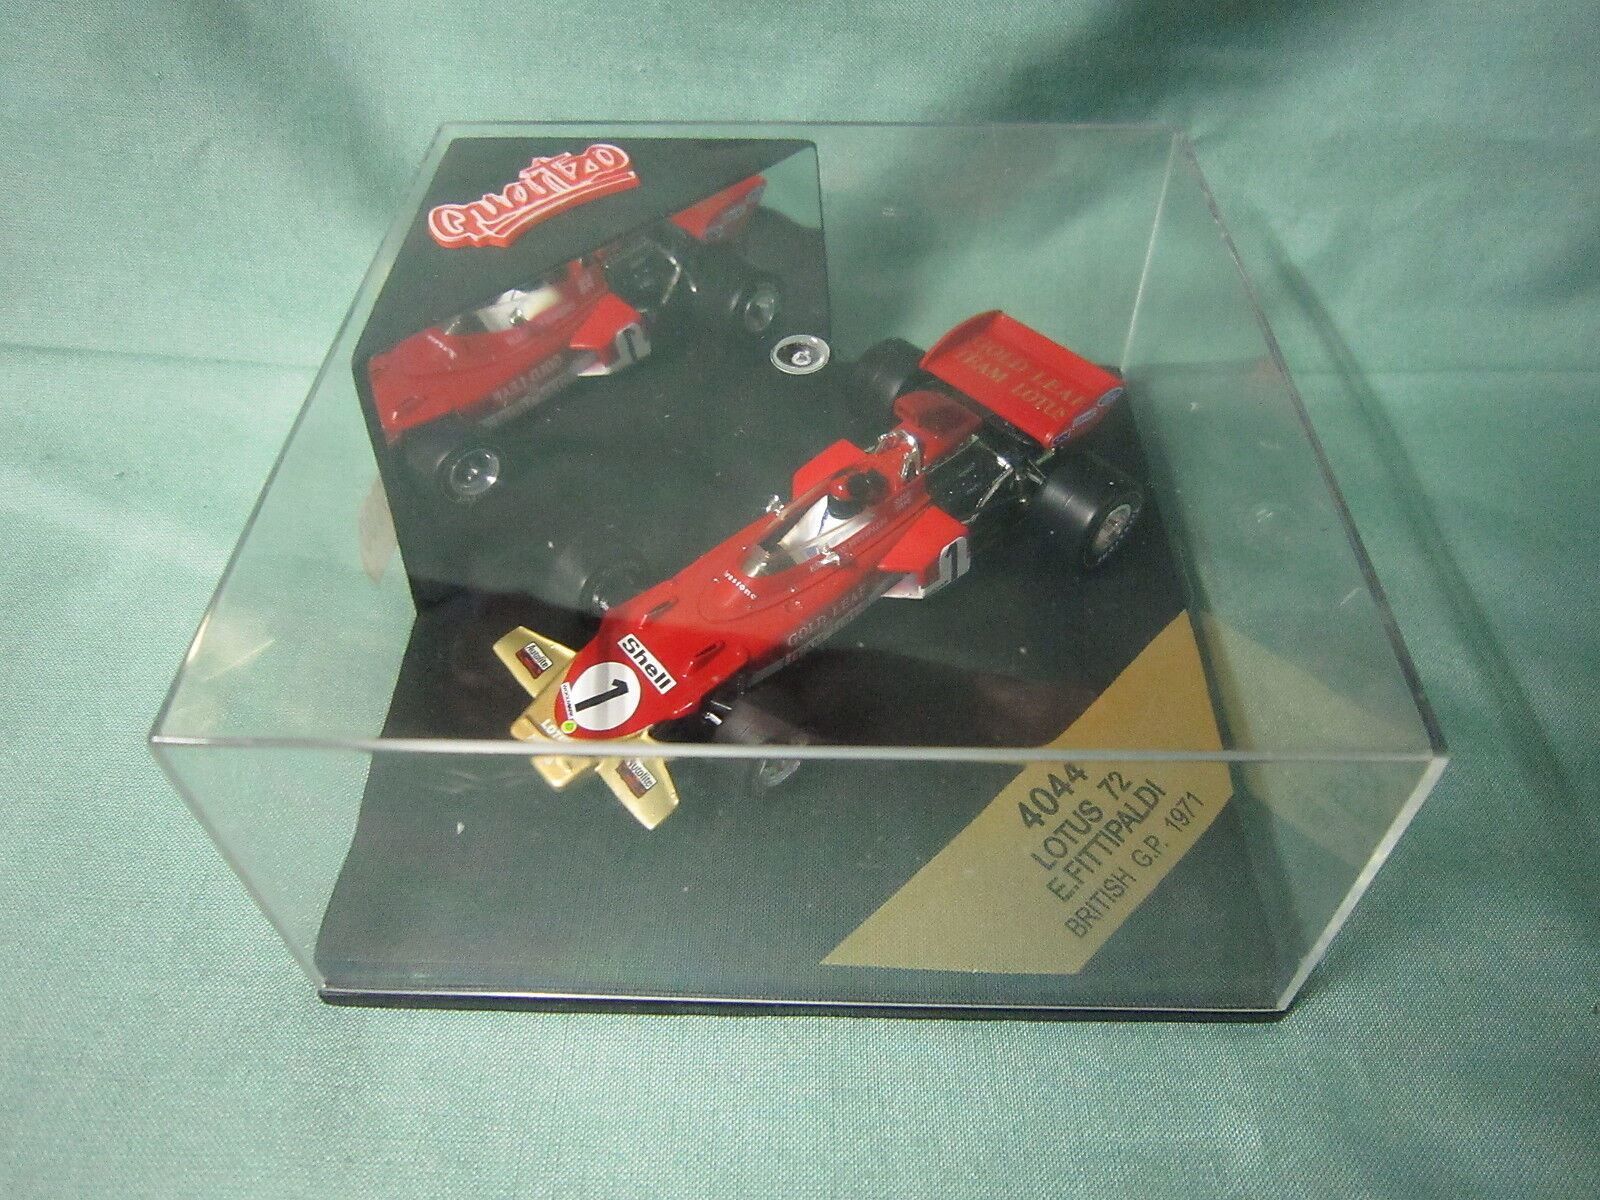 Quartzo dv6048 lotus 72 speed england gp 1971 E Fittipaldi 4044 1 43 f1